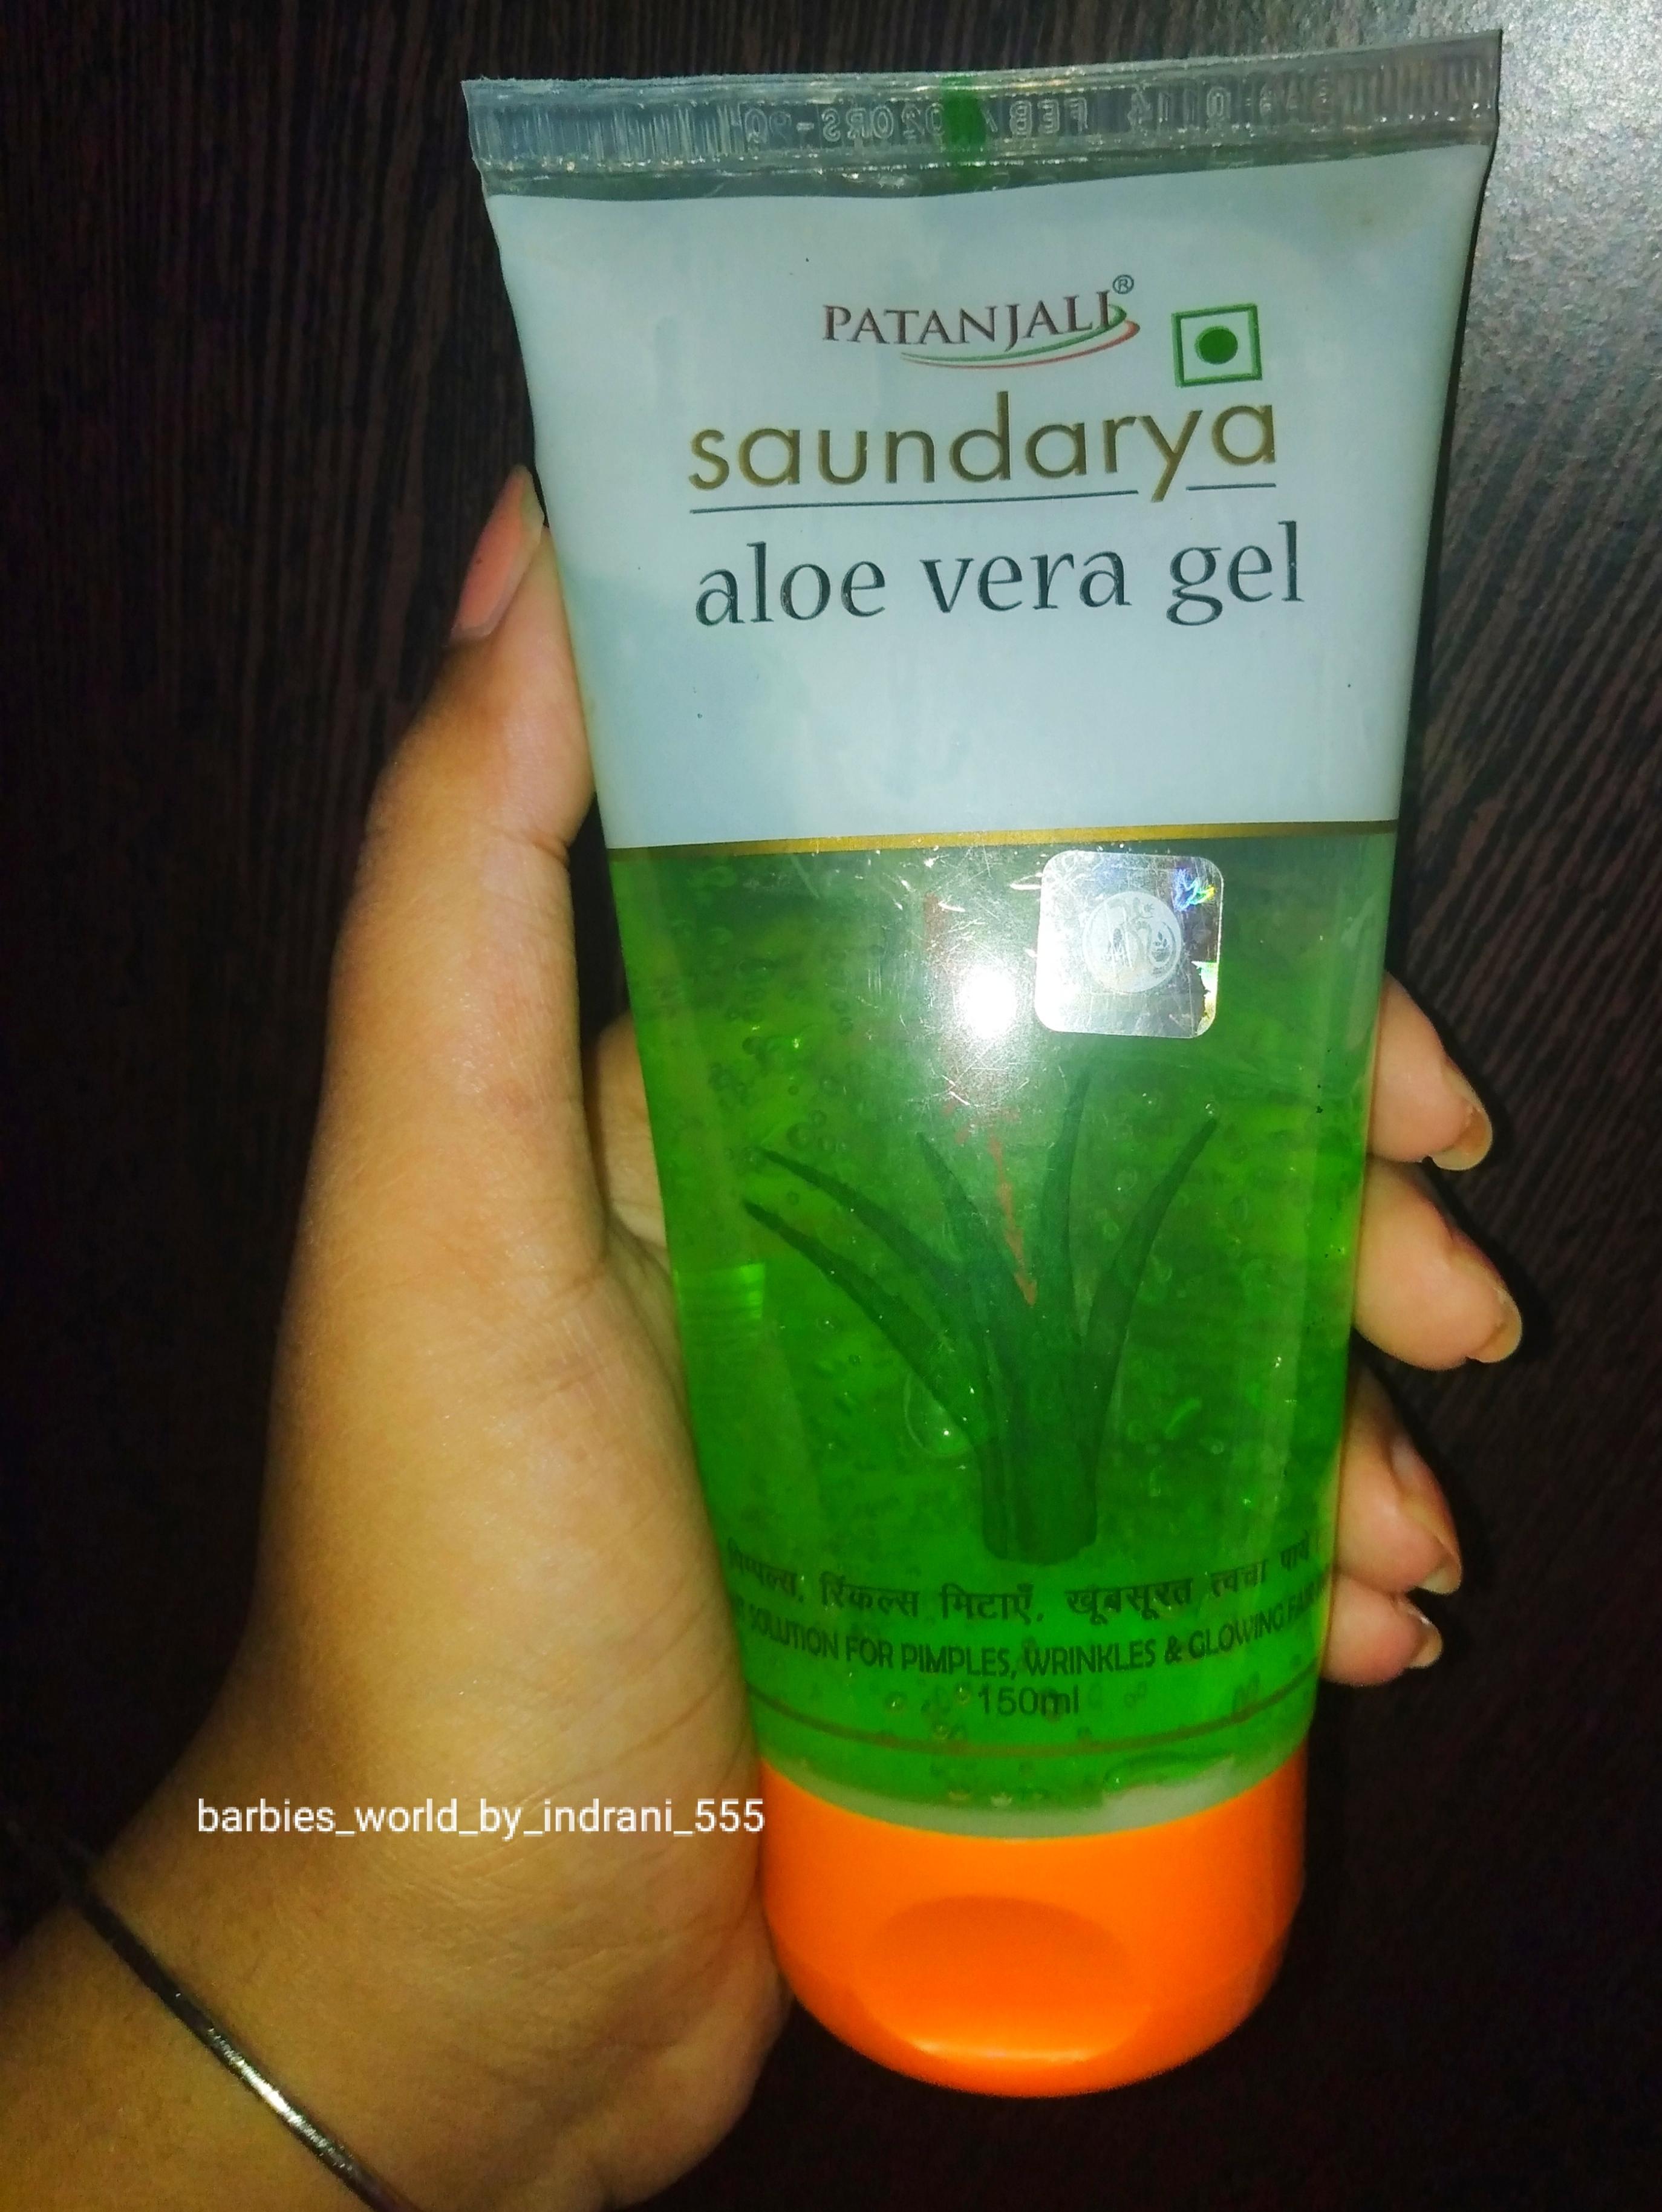 Patanjali Aloe Vera Gel -Affordable & High Quality Aloe Vera Gel-By indranireviews